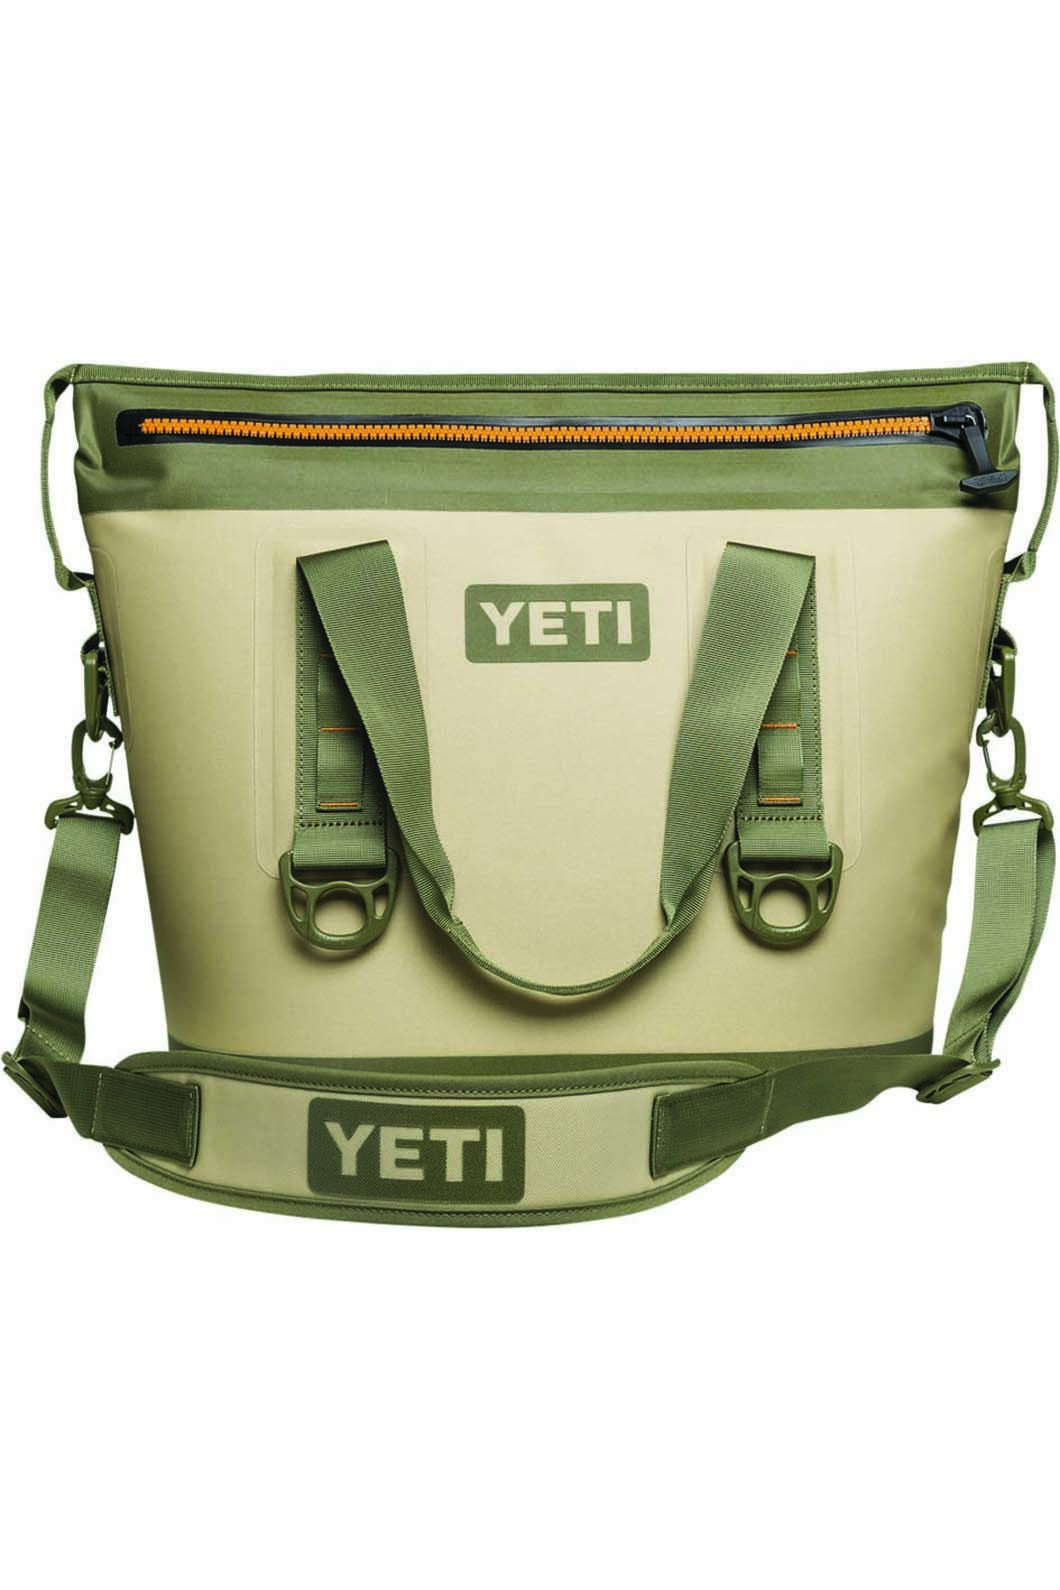 Yeti Hopper Two 20 Soft Cooler, Tan, hi-res